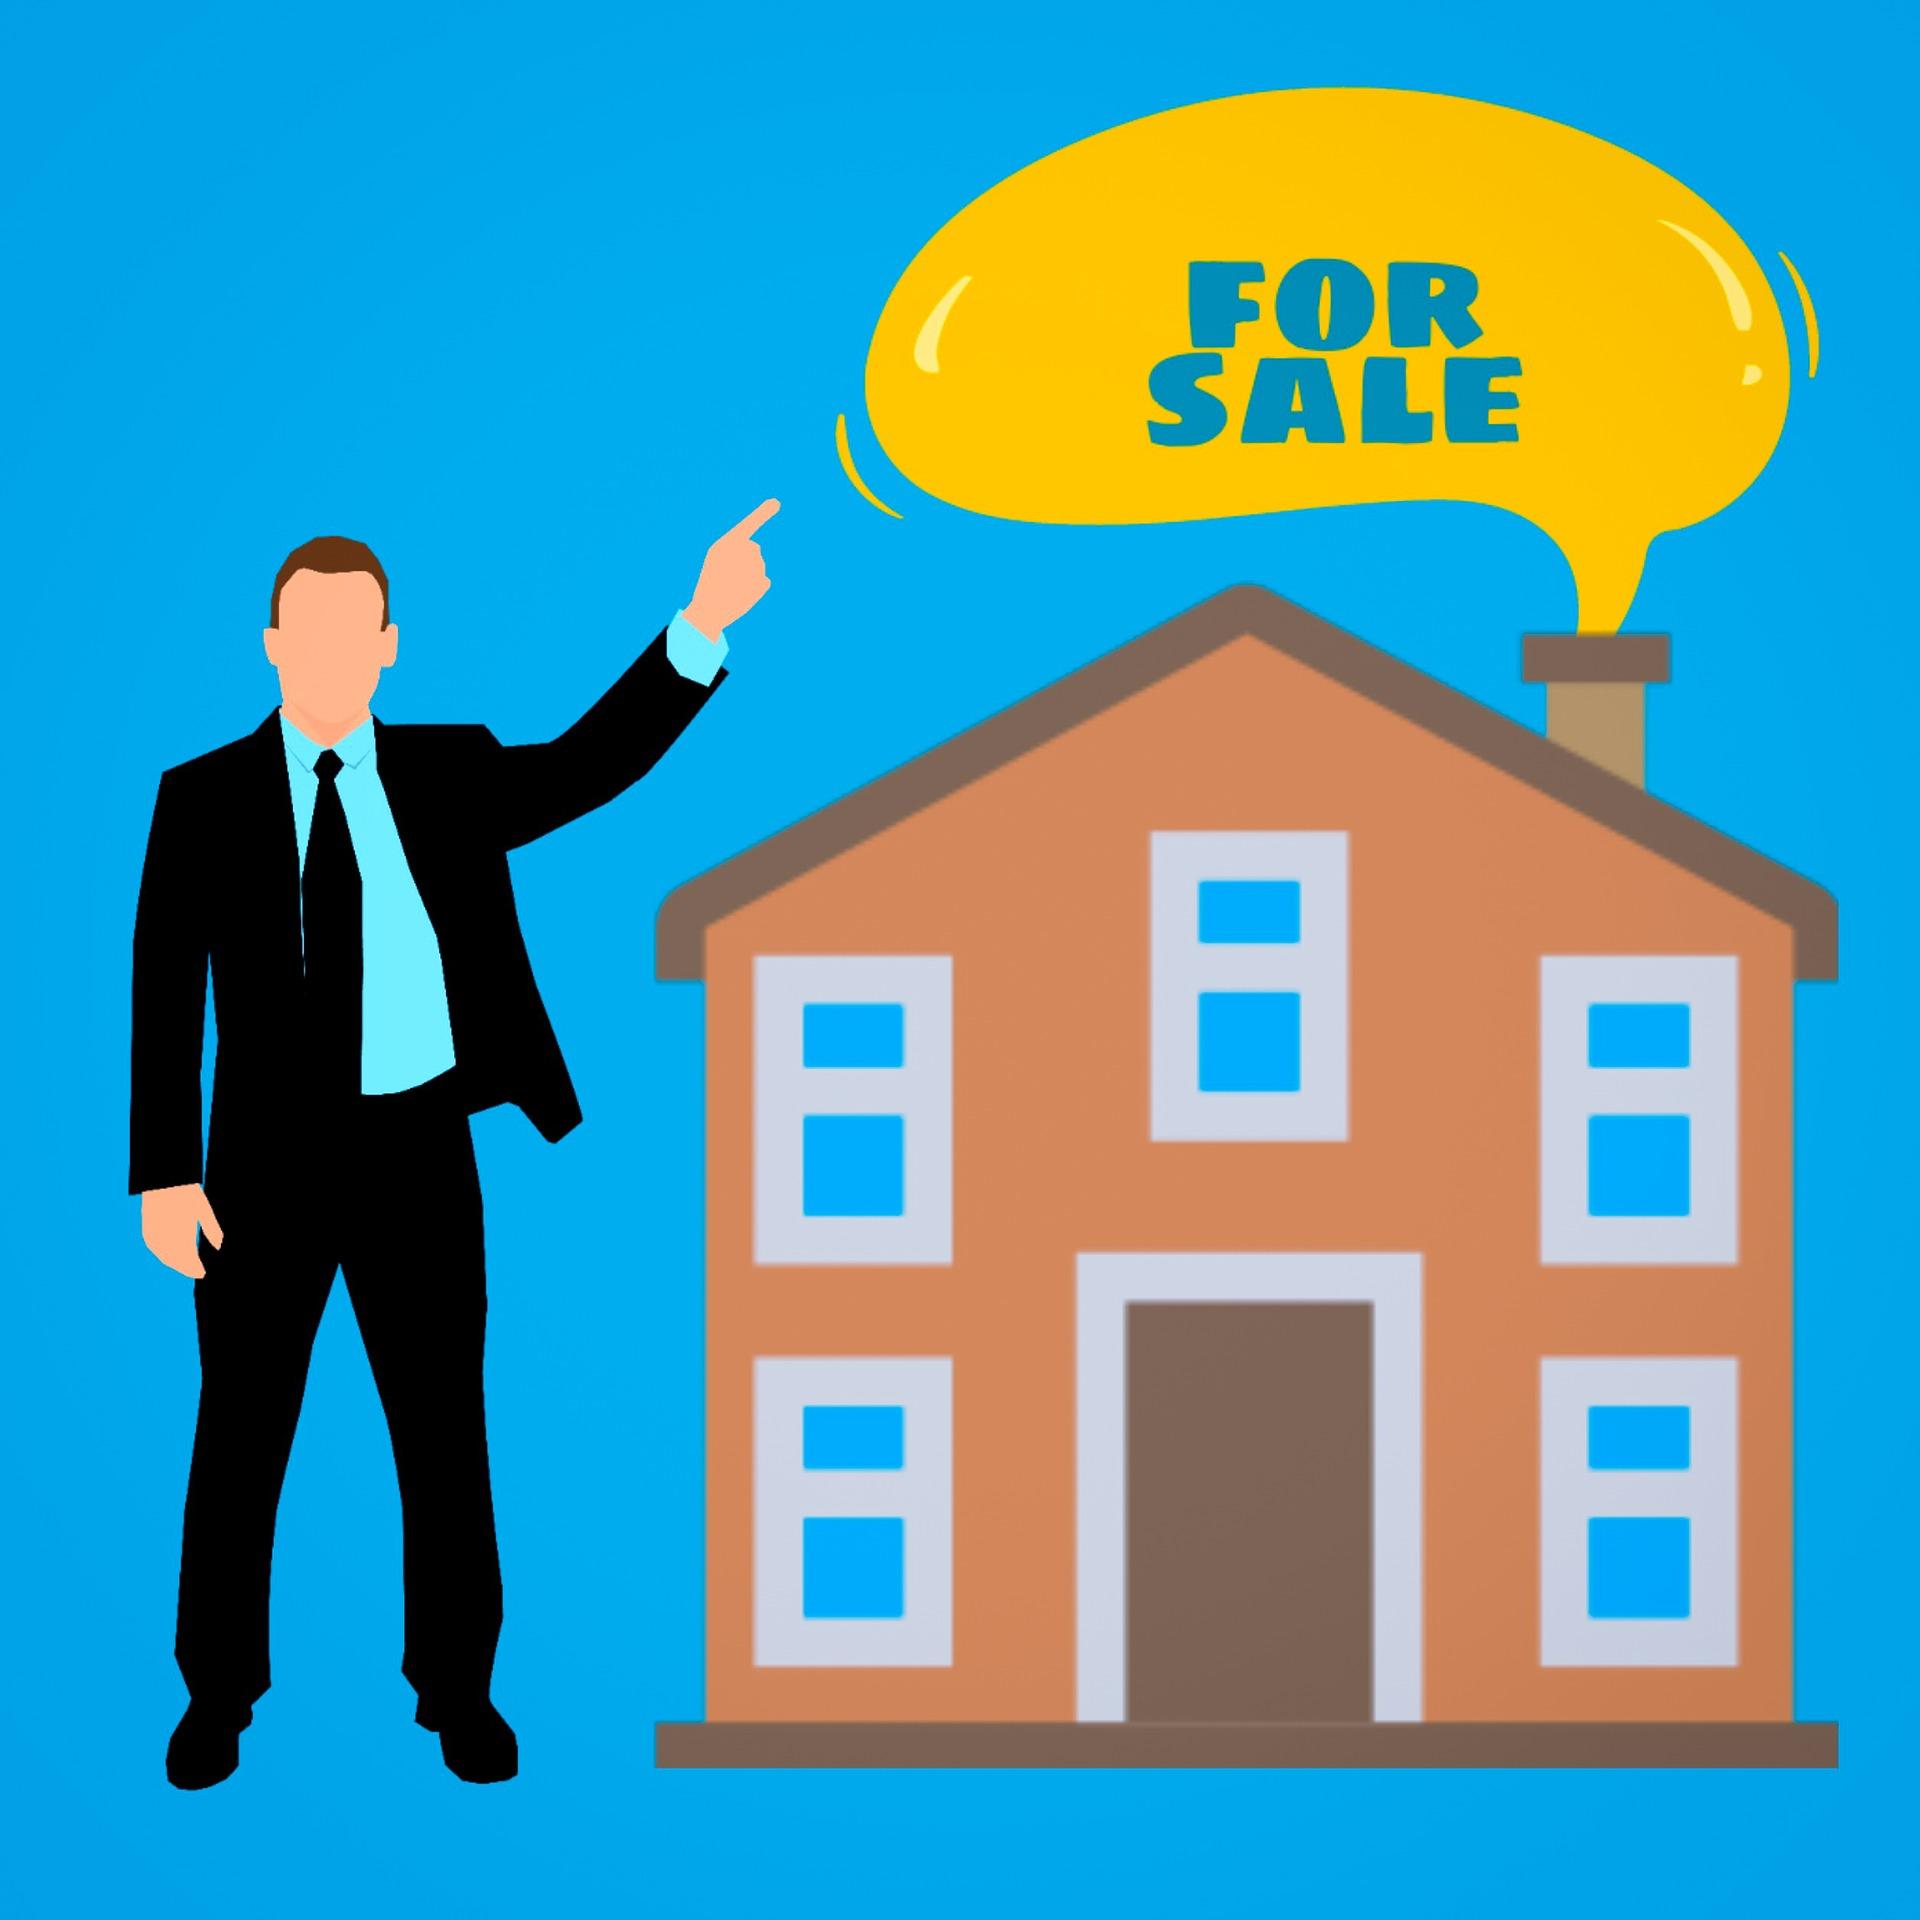 www.g.page/your-australian-property-buyers